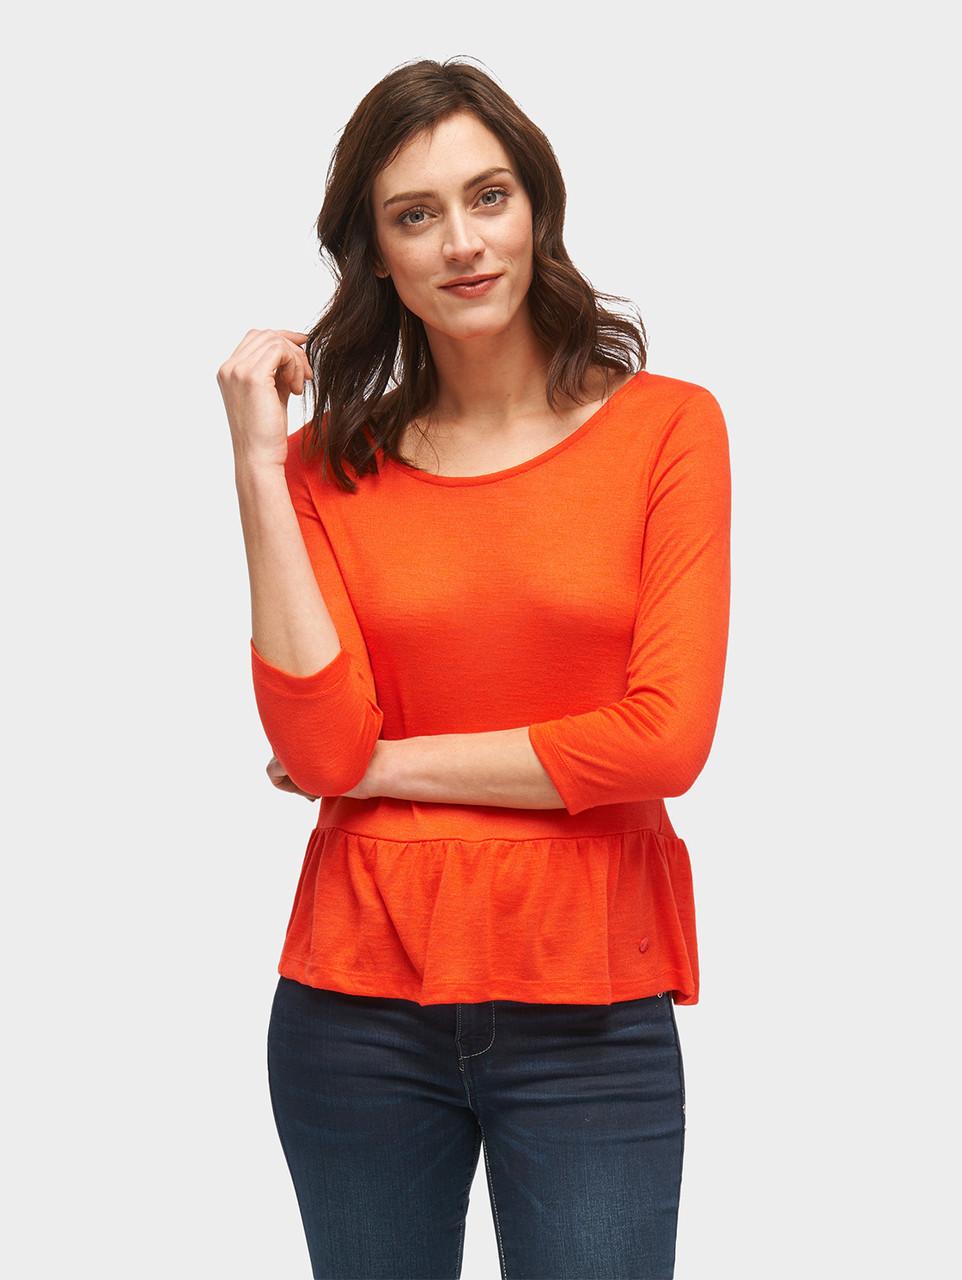 Блуза Tom Tailor 10555420070 M Оранжевый